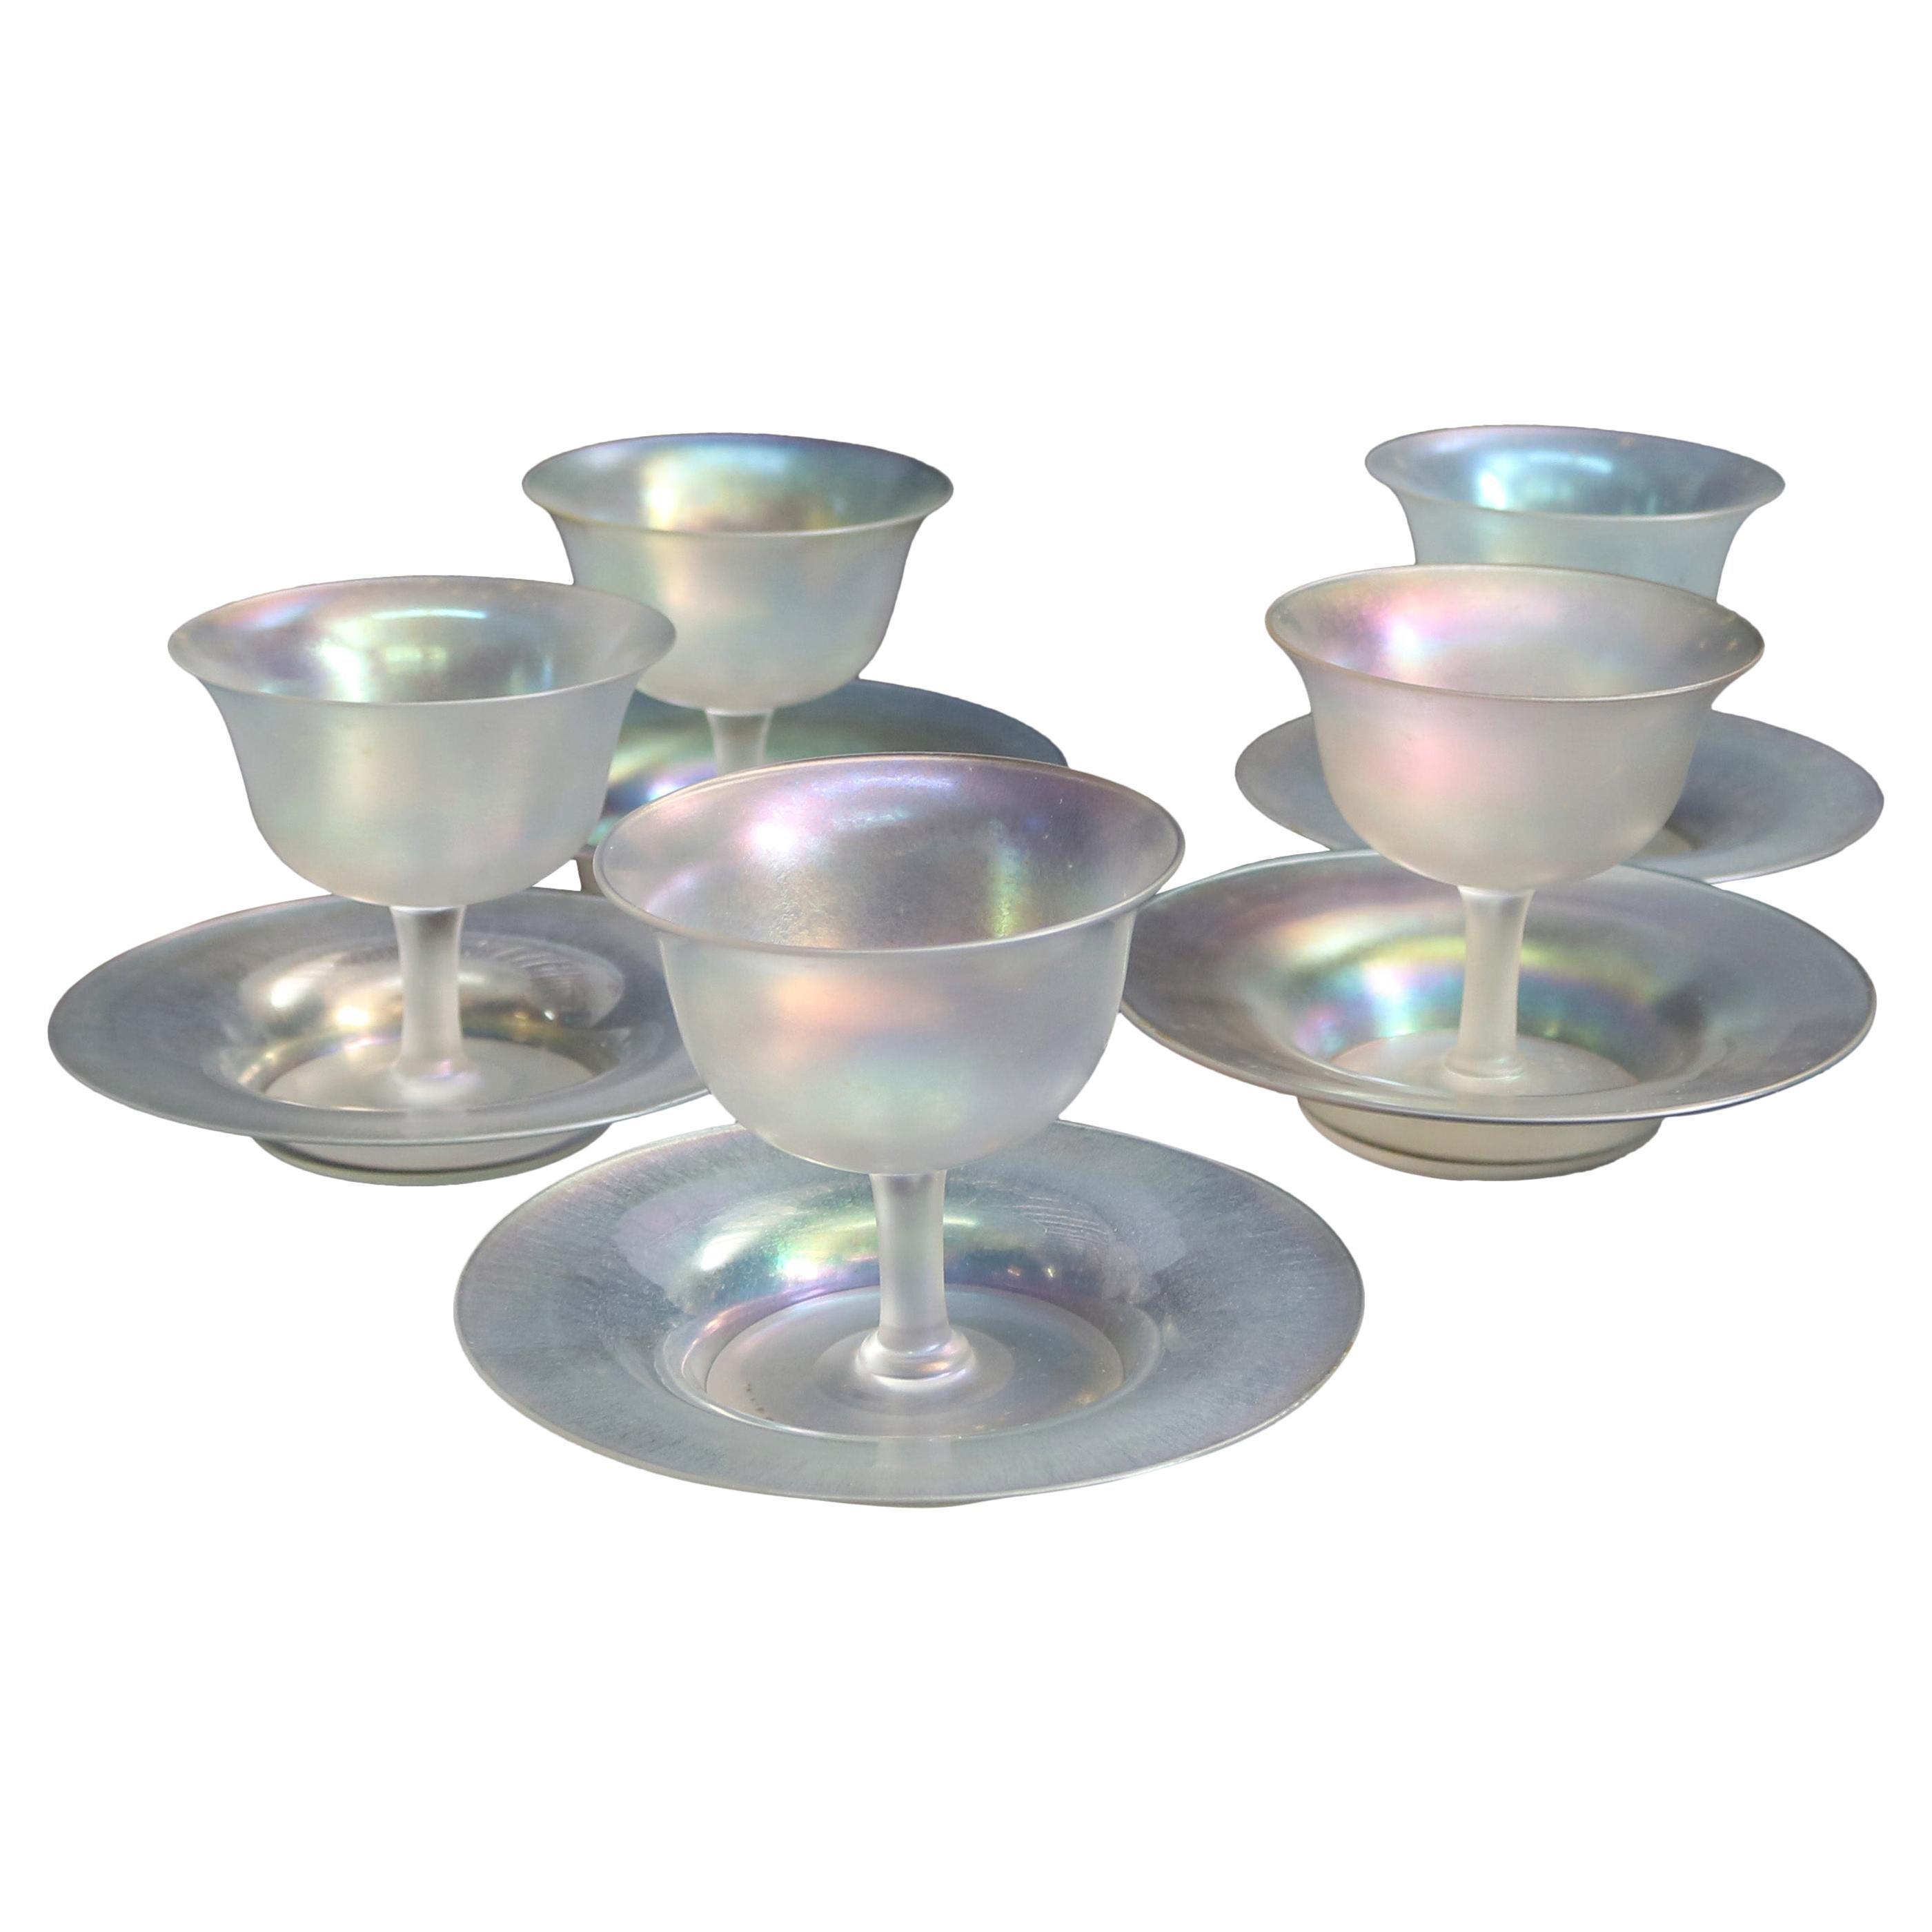 Steuben Art Glass Stemmed Sherbet Goblets with Saucers, circa 1930s